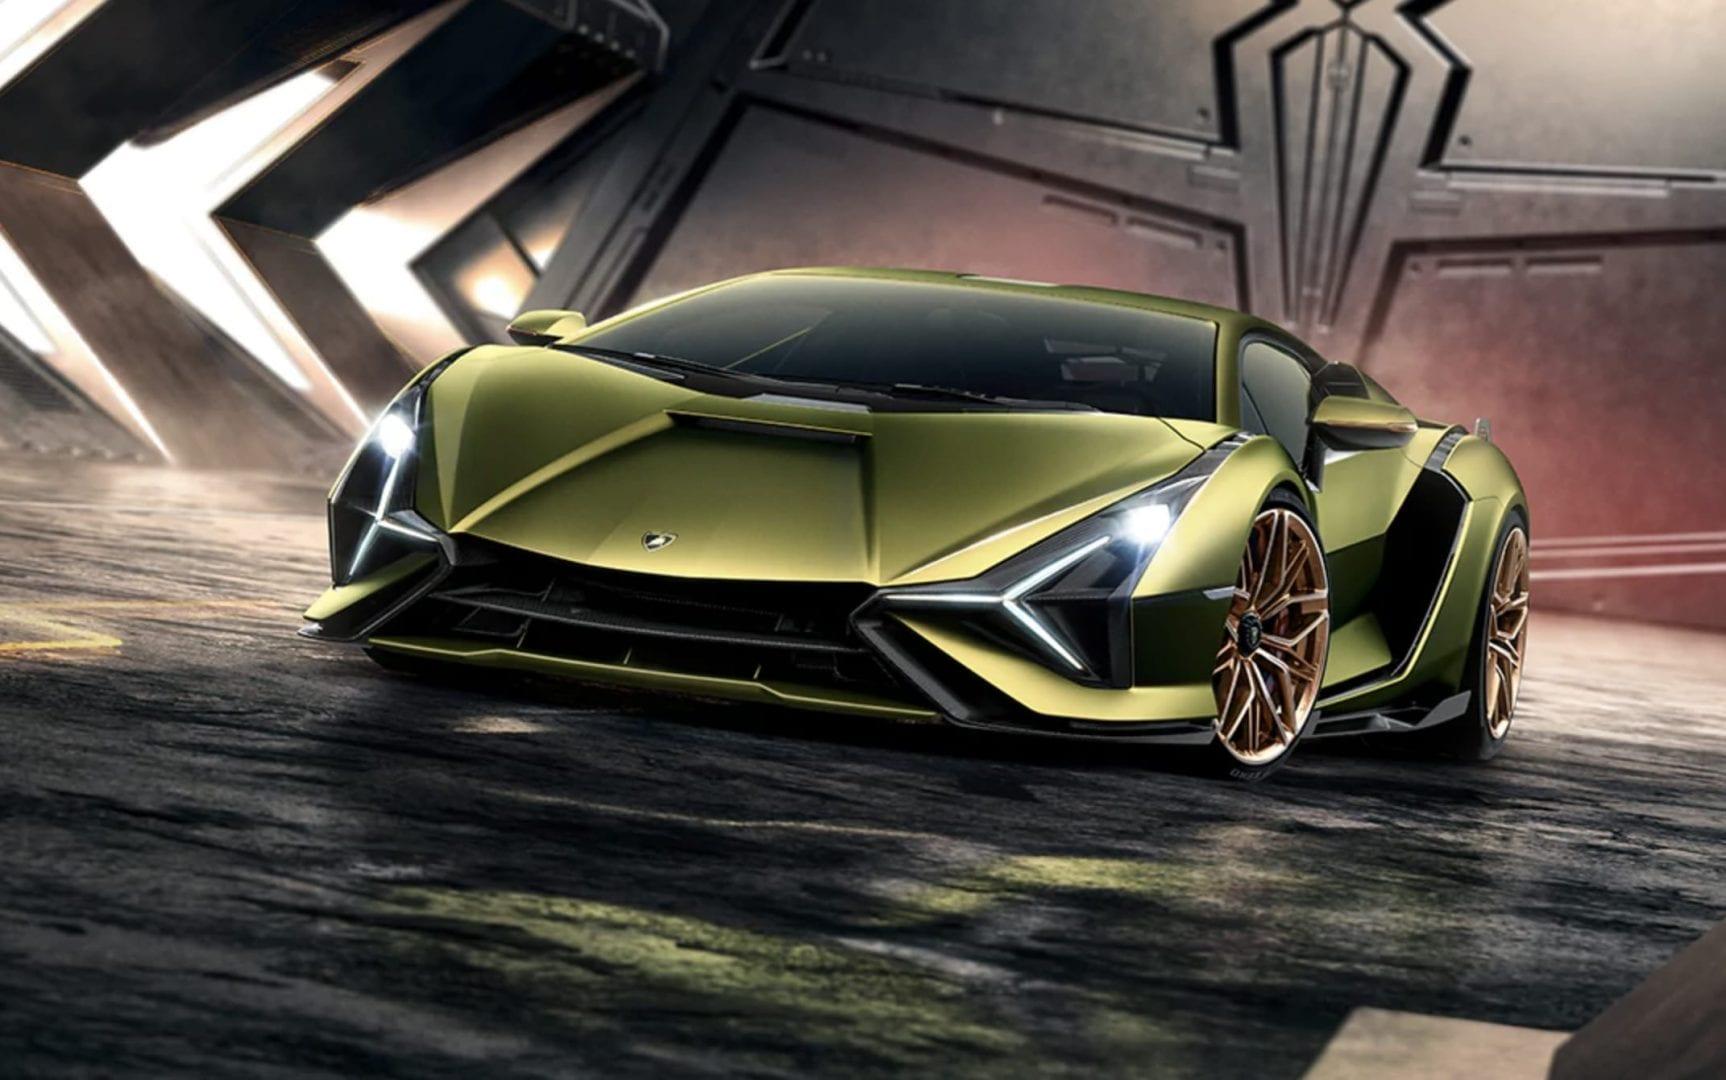 New Lamborghini Sián is the most customizable Lambo ever